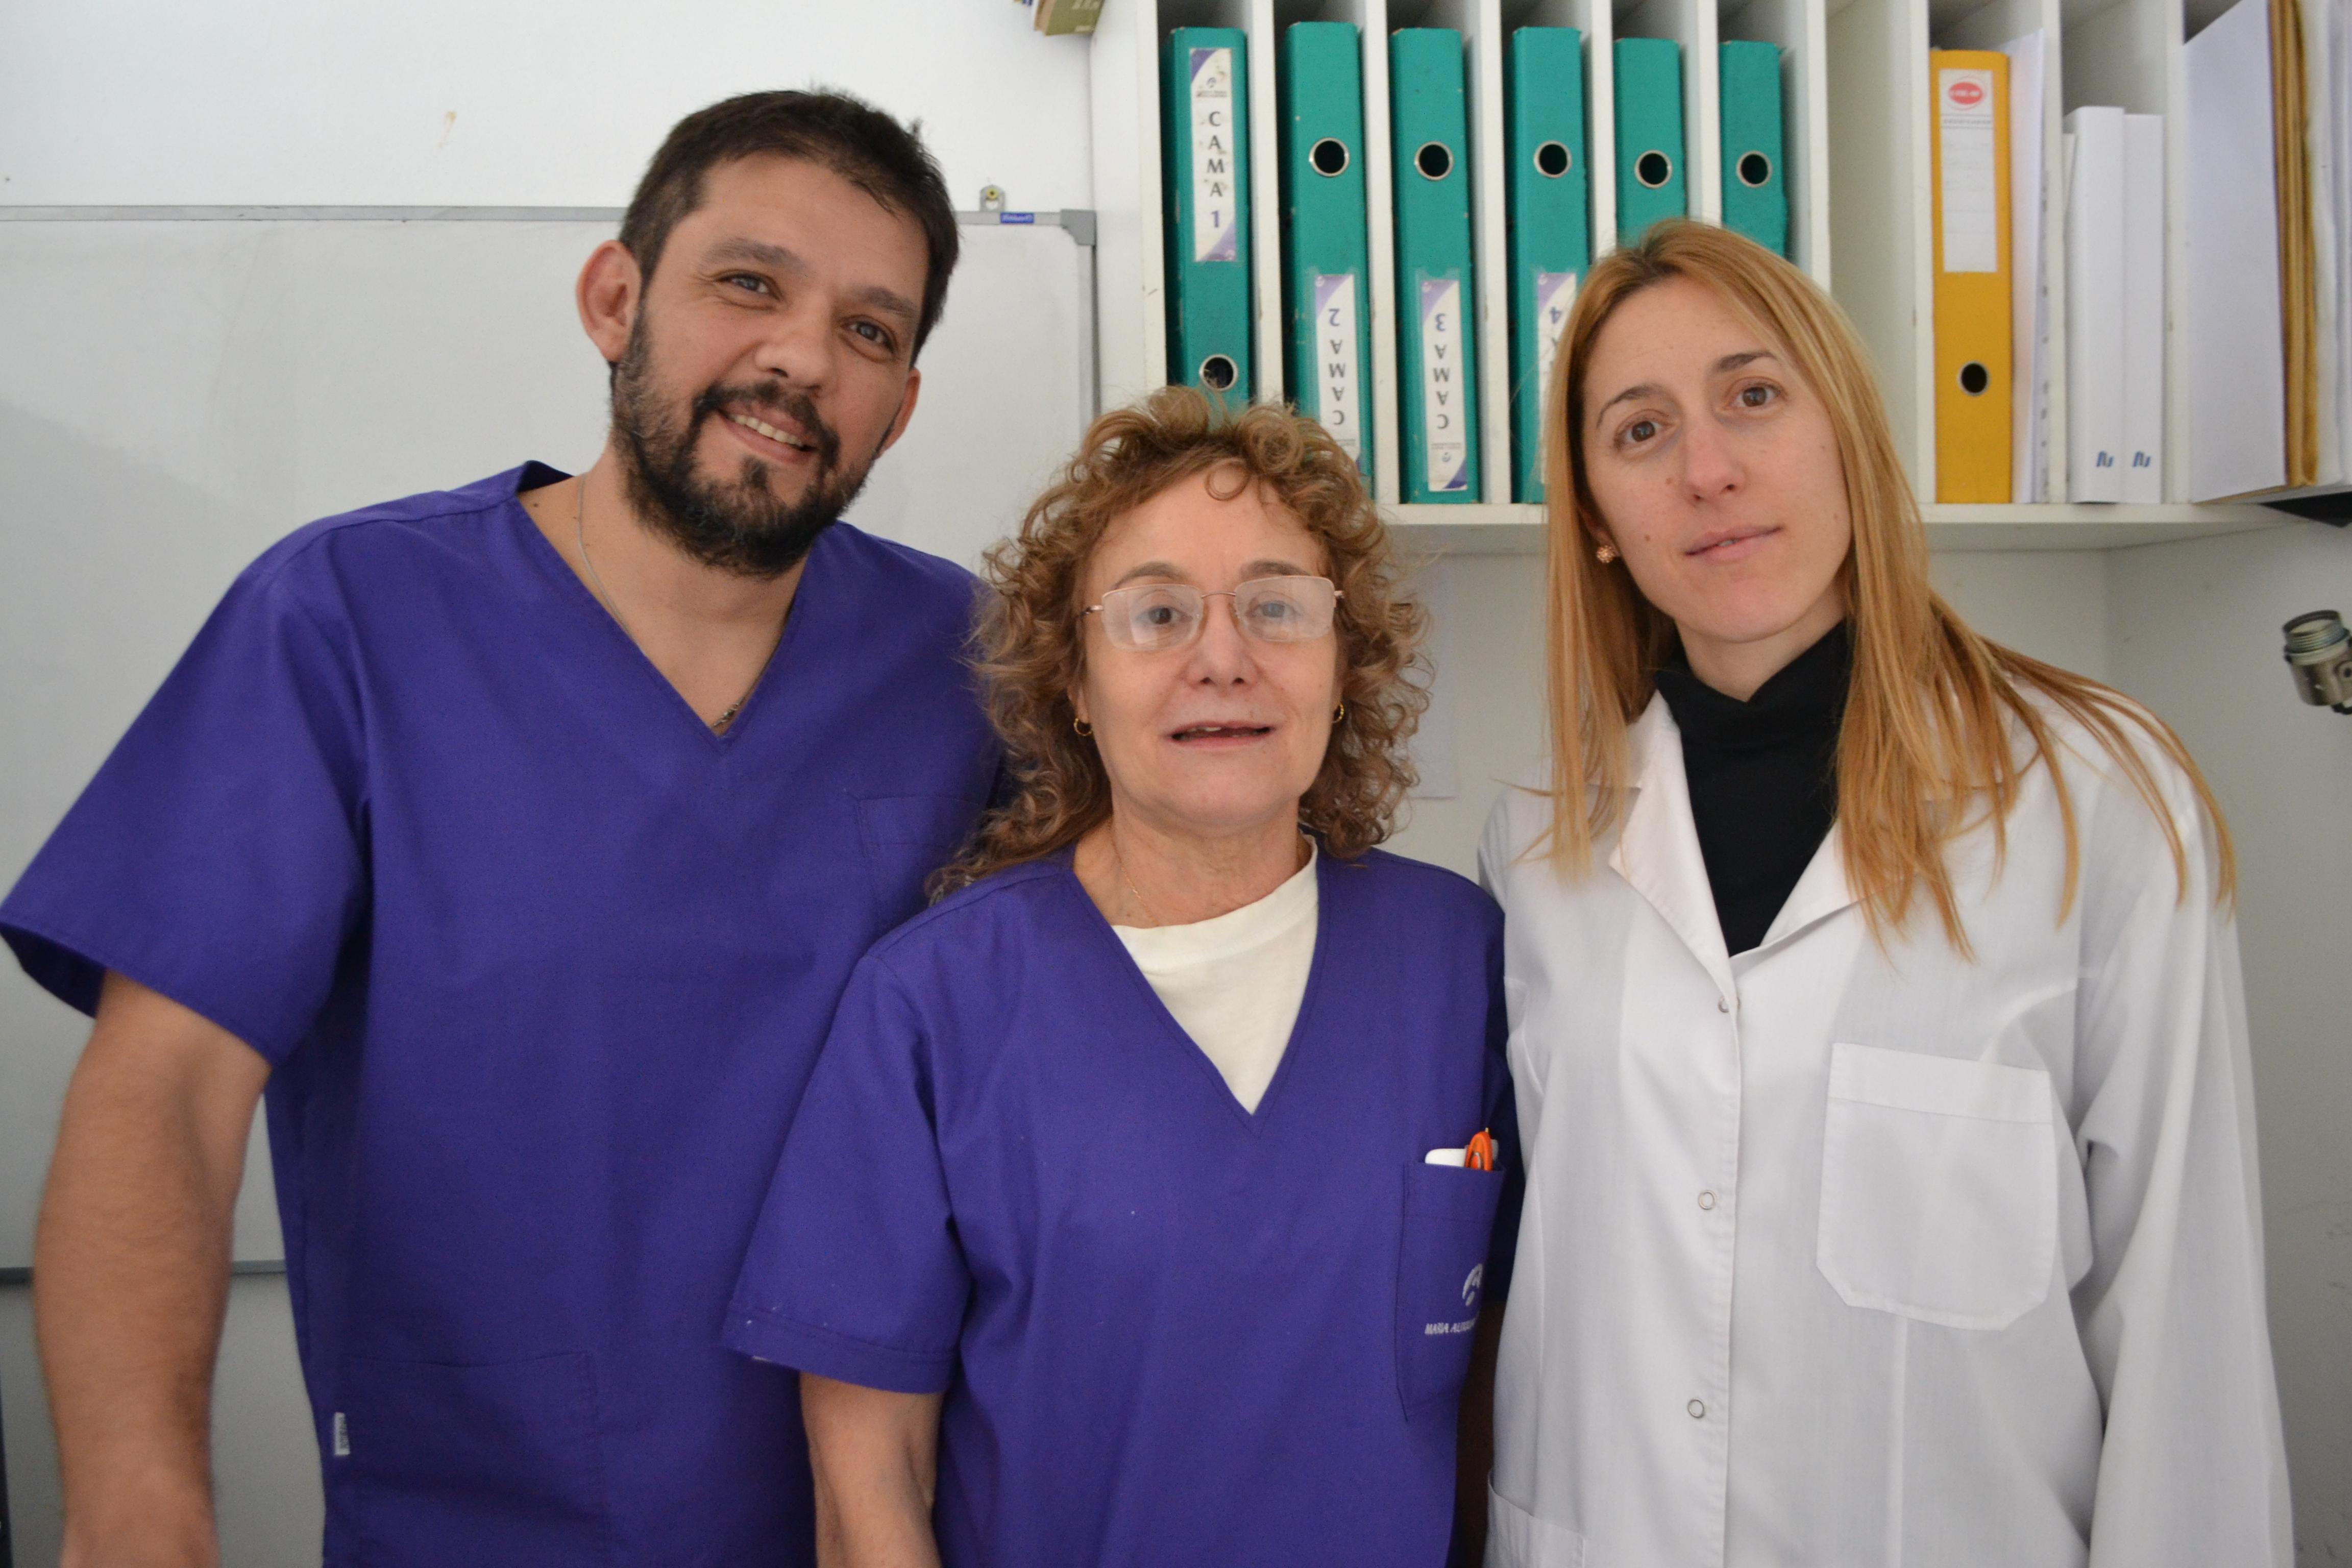 Terapia intensiva, un servicio que crece